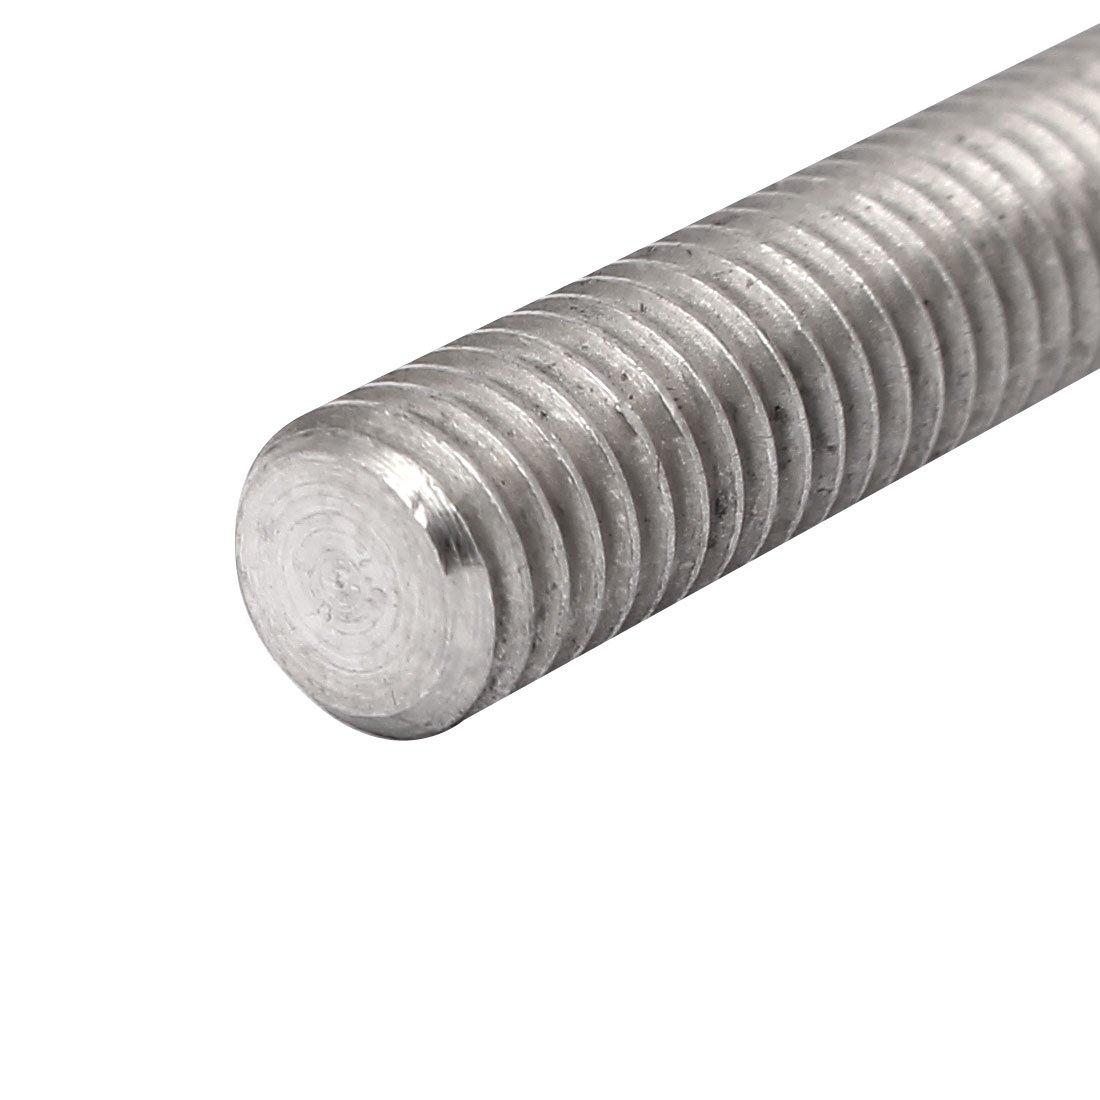 uxcell M8x110mm Thread 304 Stainless Steel Hex Socket Head Cap Screw Bolt DIN912 5pcs a16091200ux0599